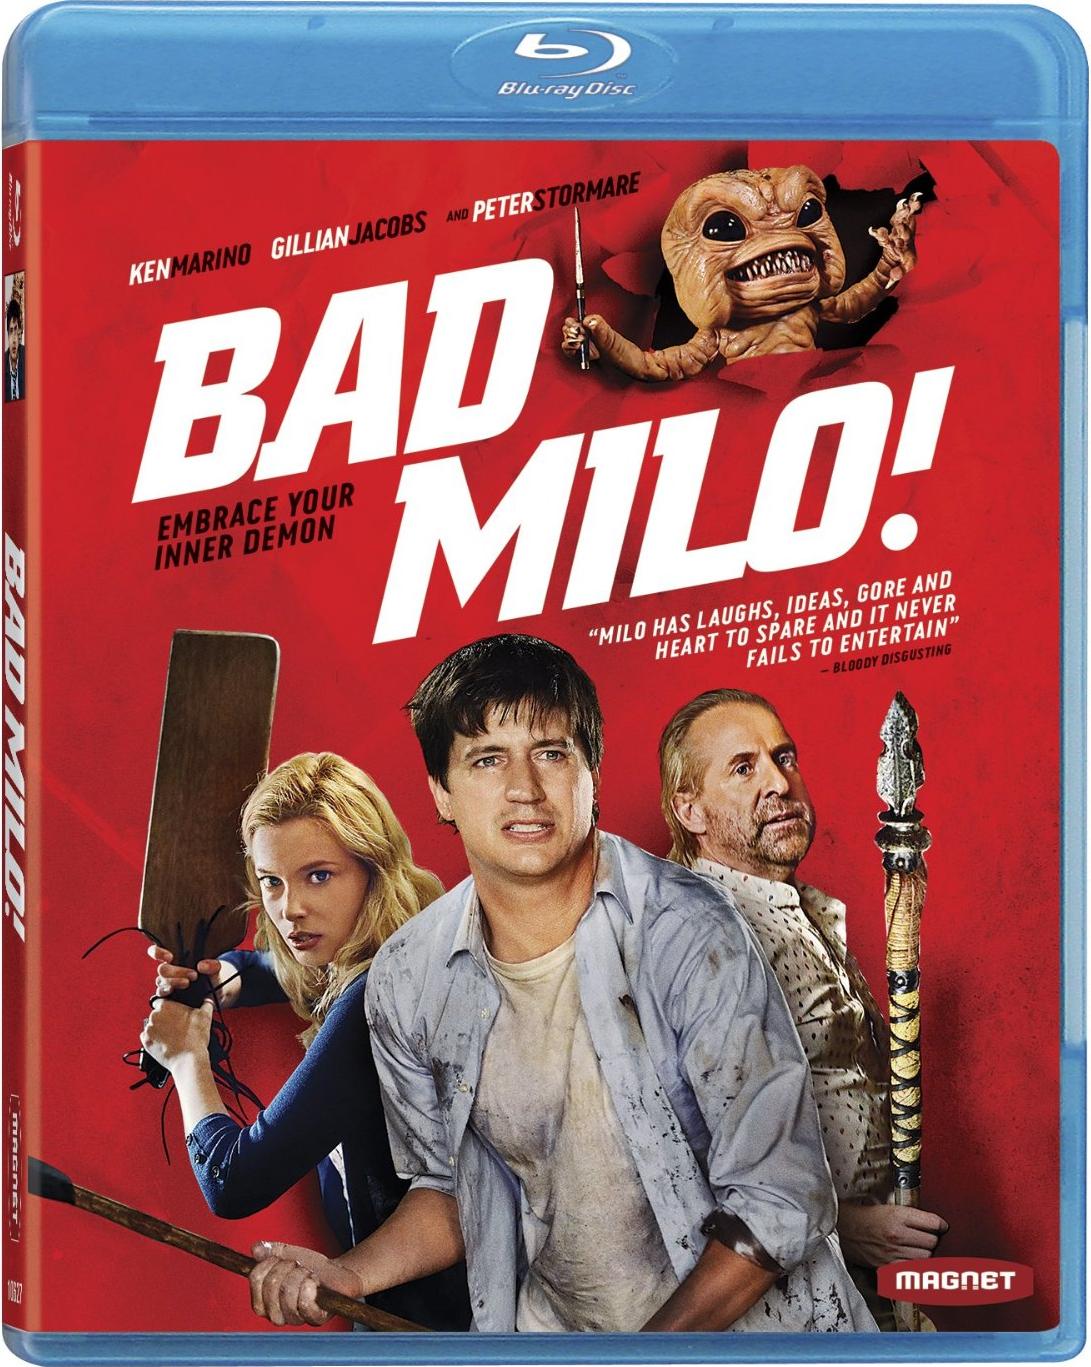 Order Bad Milo!